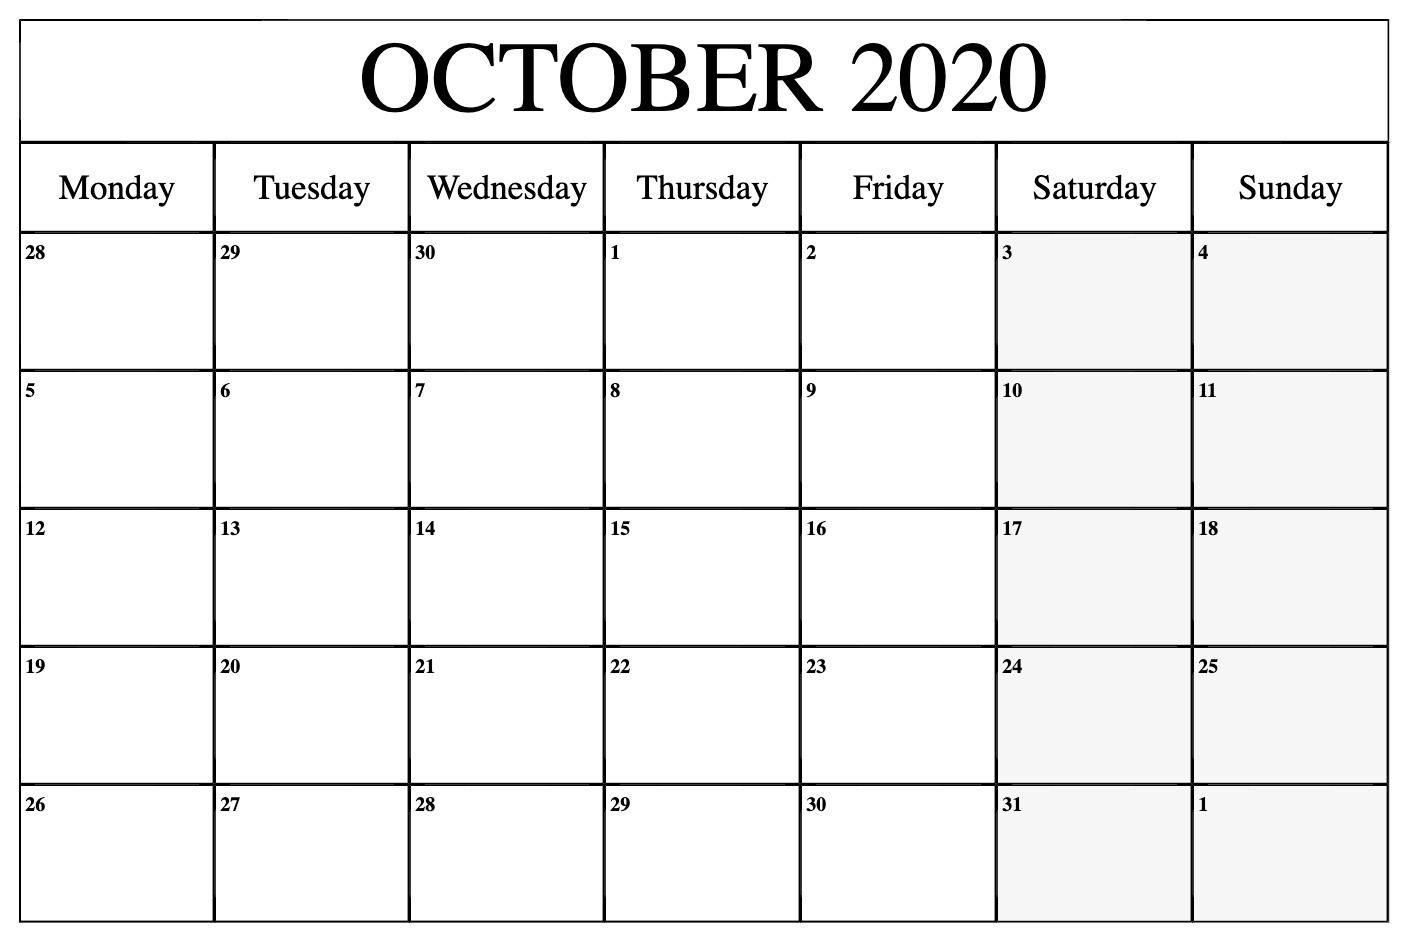 October 2020 Calendar   Printable Calendar Word, Printable throughout 2020 Month Calendar Sunday Through Saturday